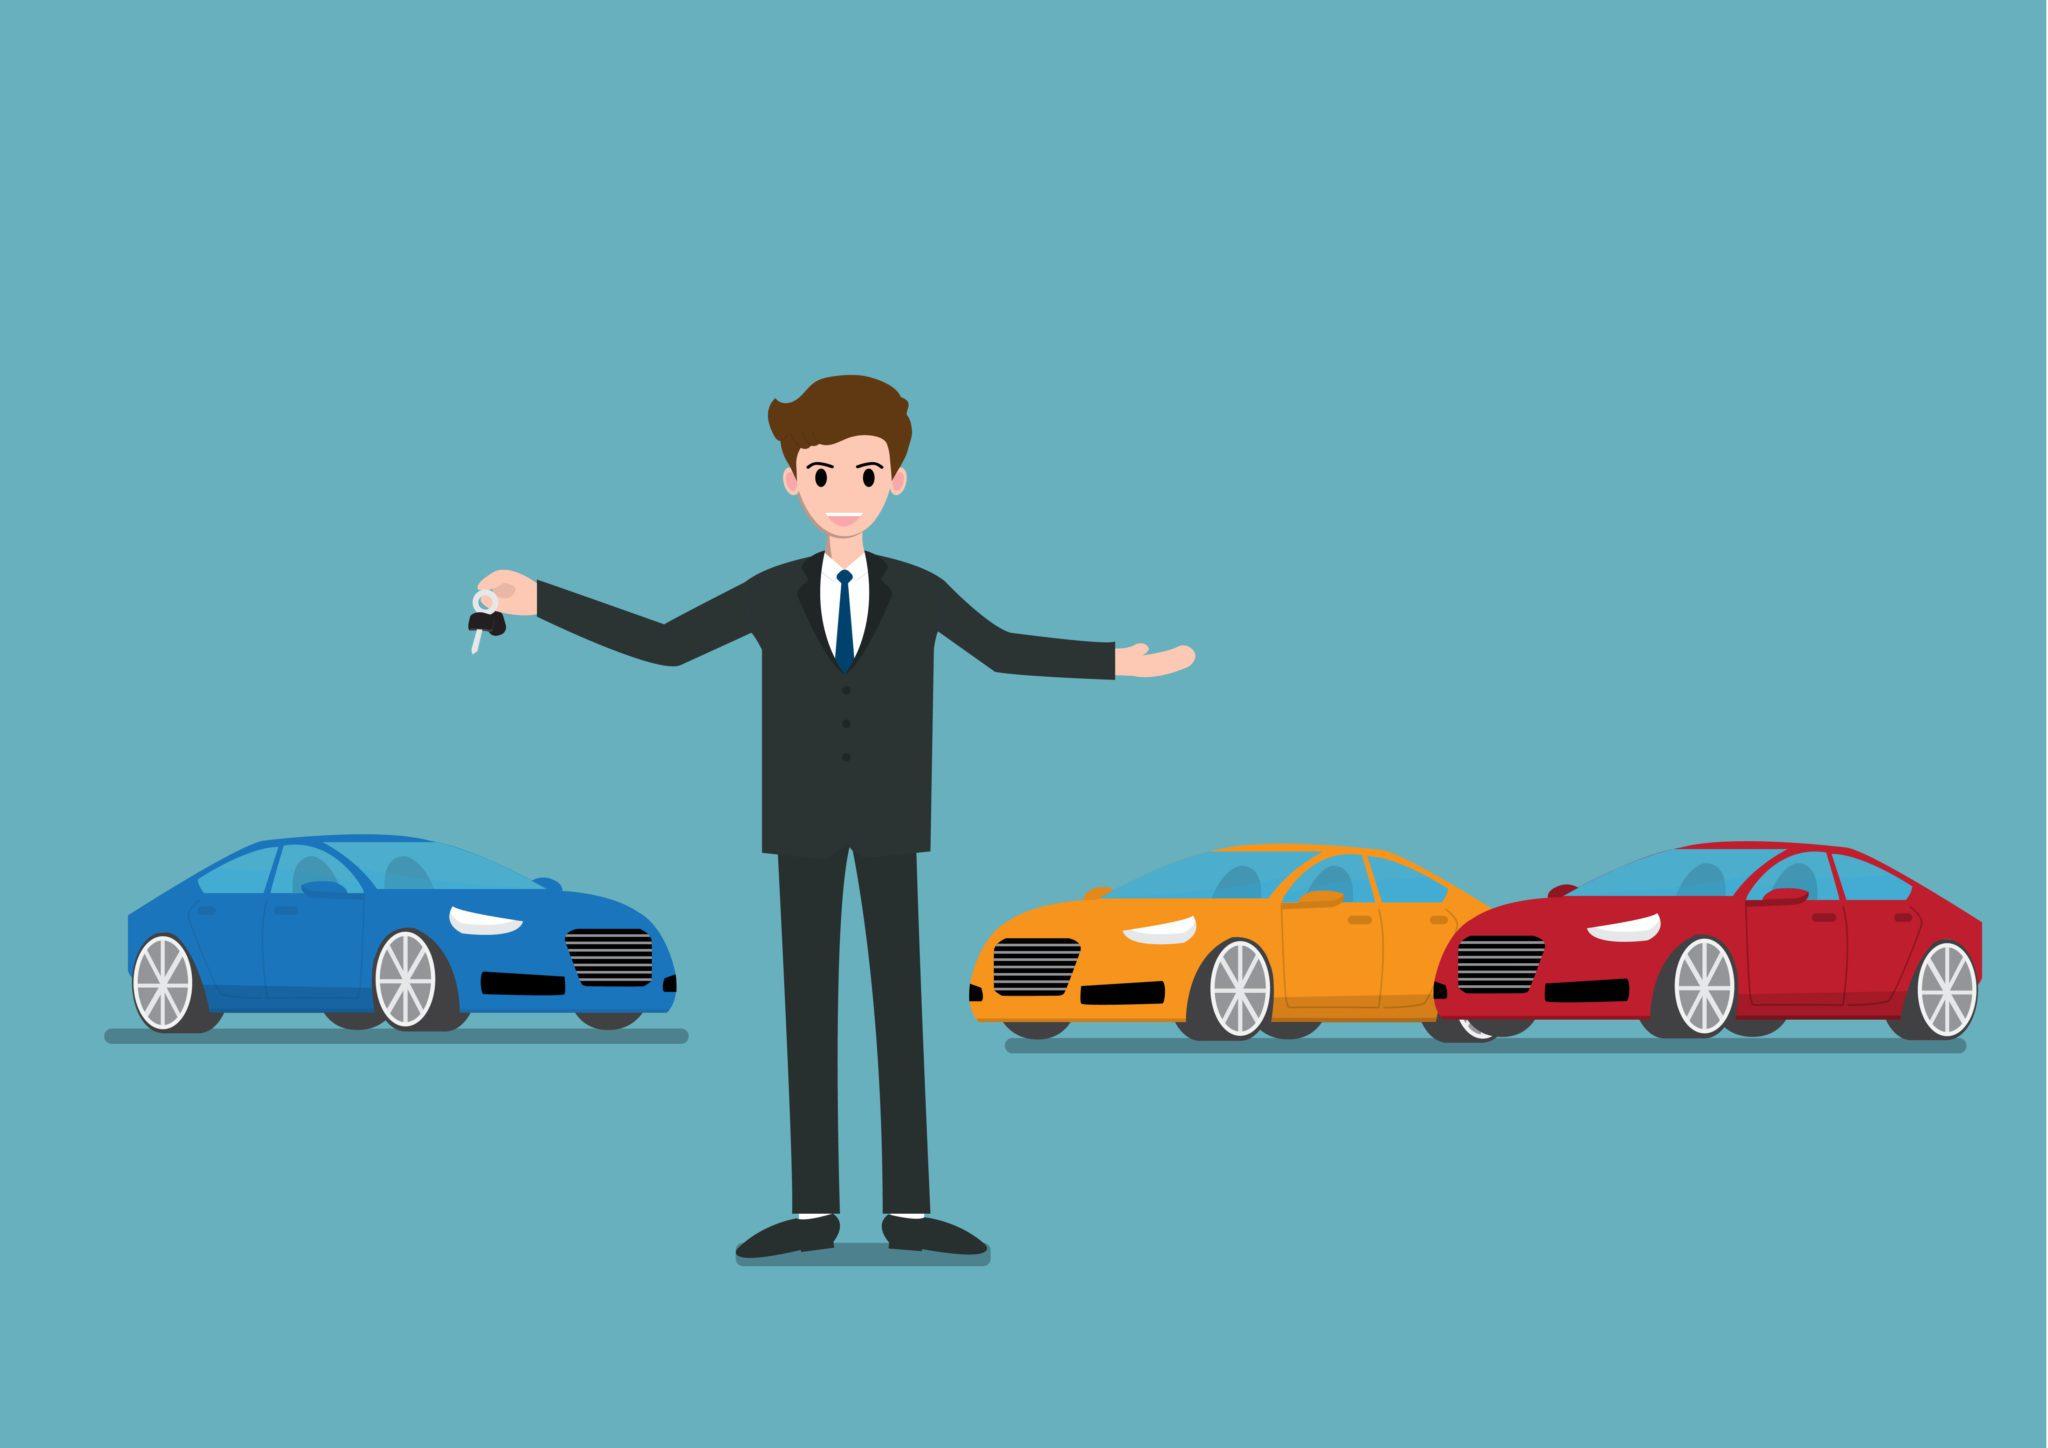 Car salesperson illustration